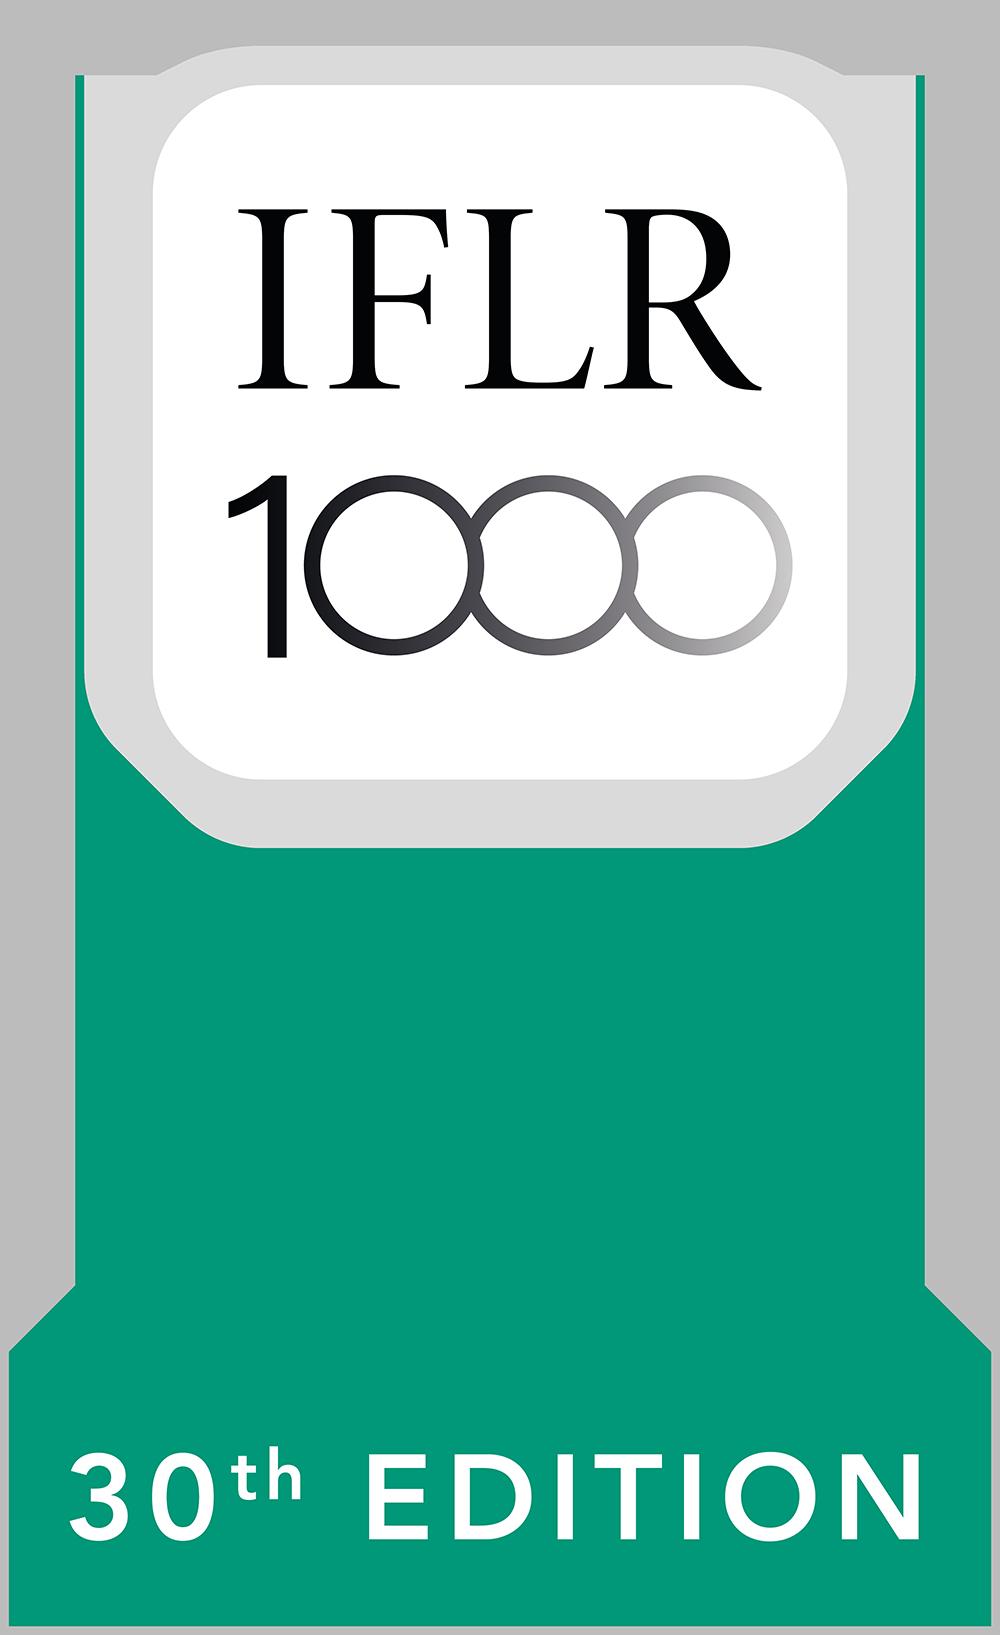 IFLR Market Leader 2021